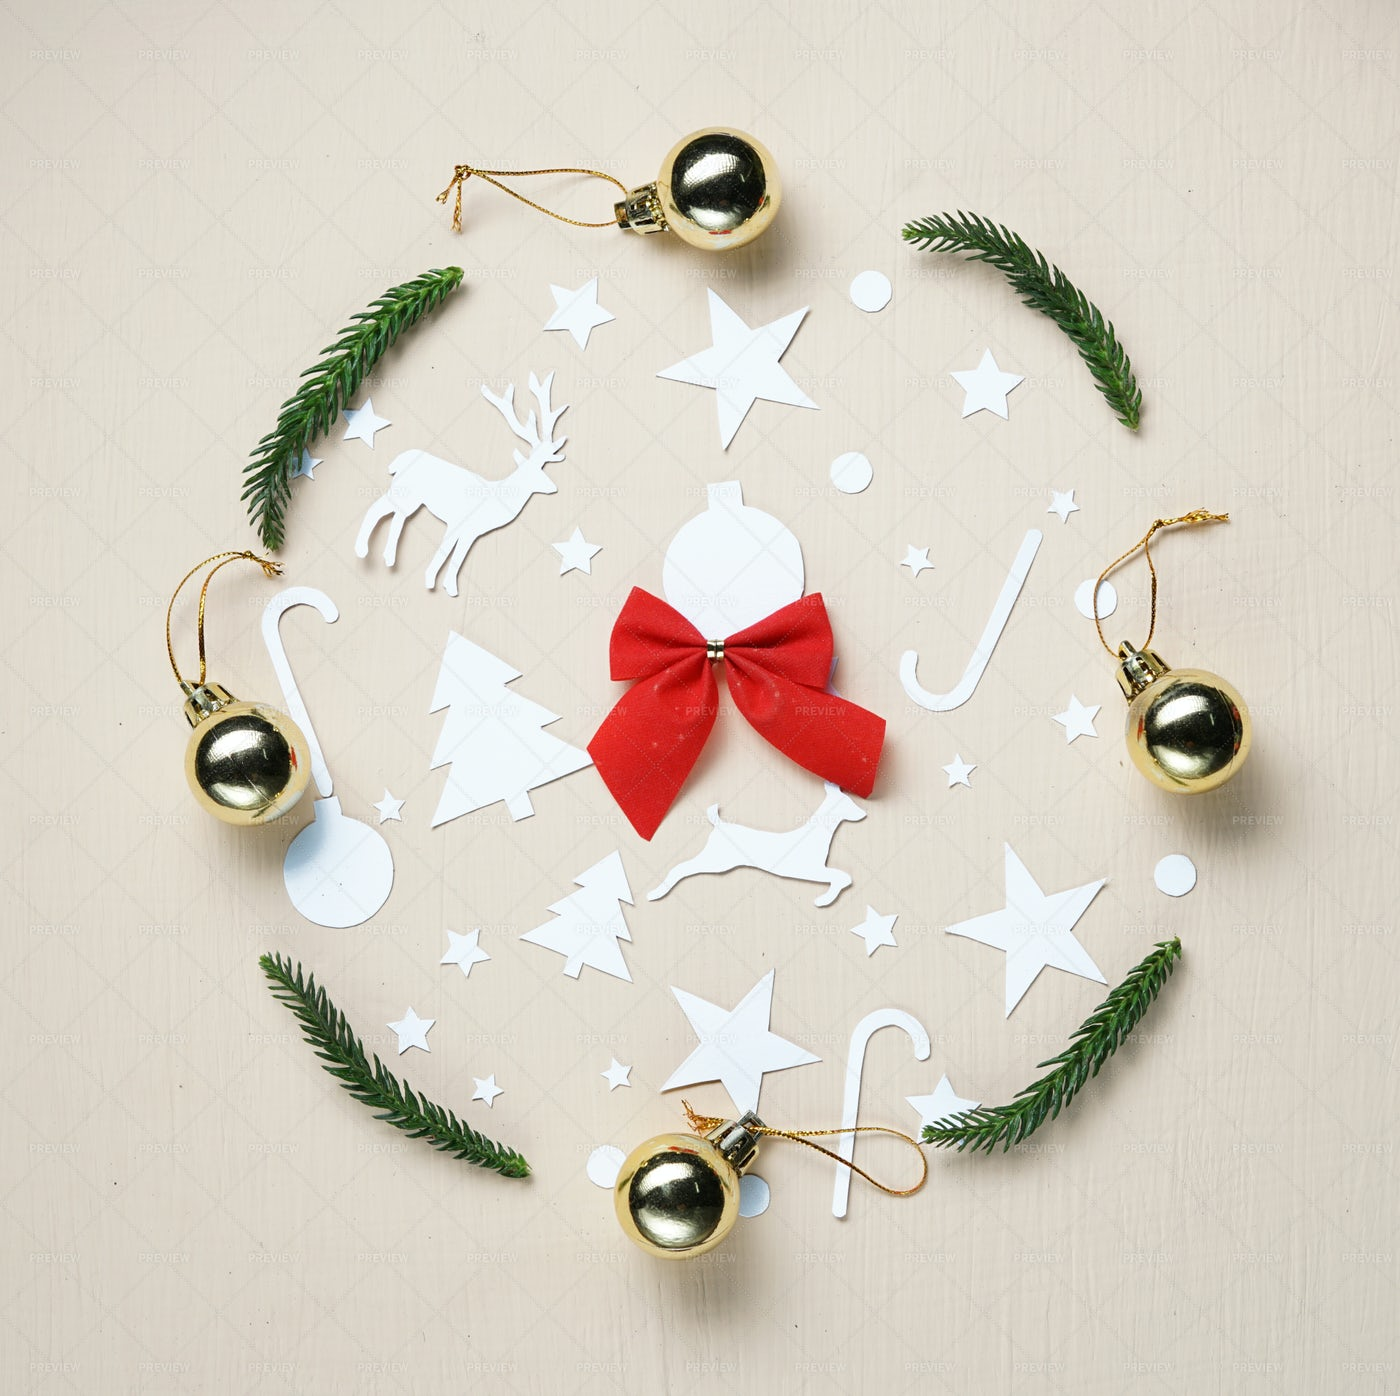 Christmas Object Circle: Stock Photos